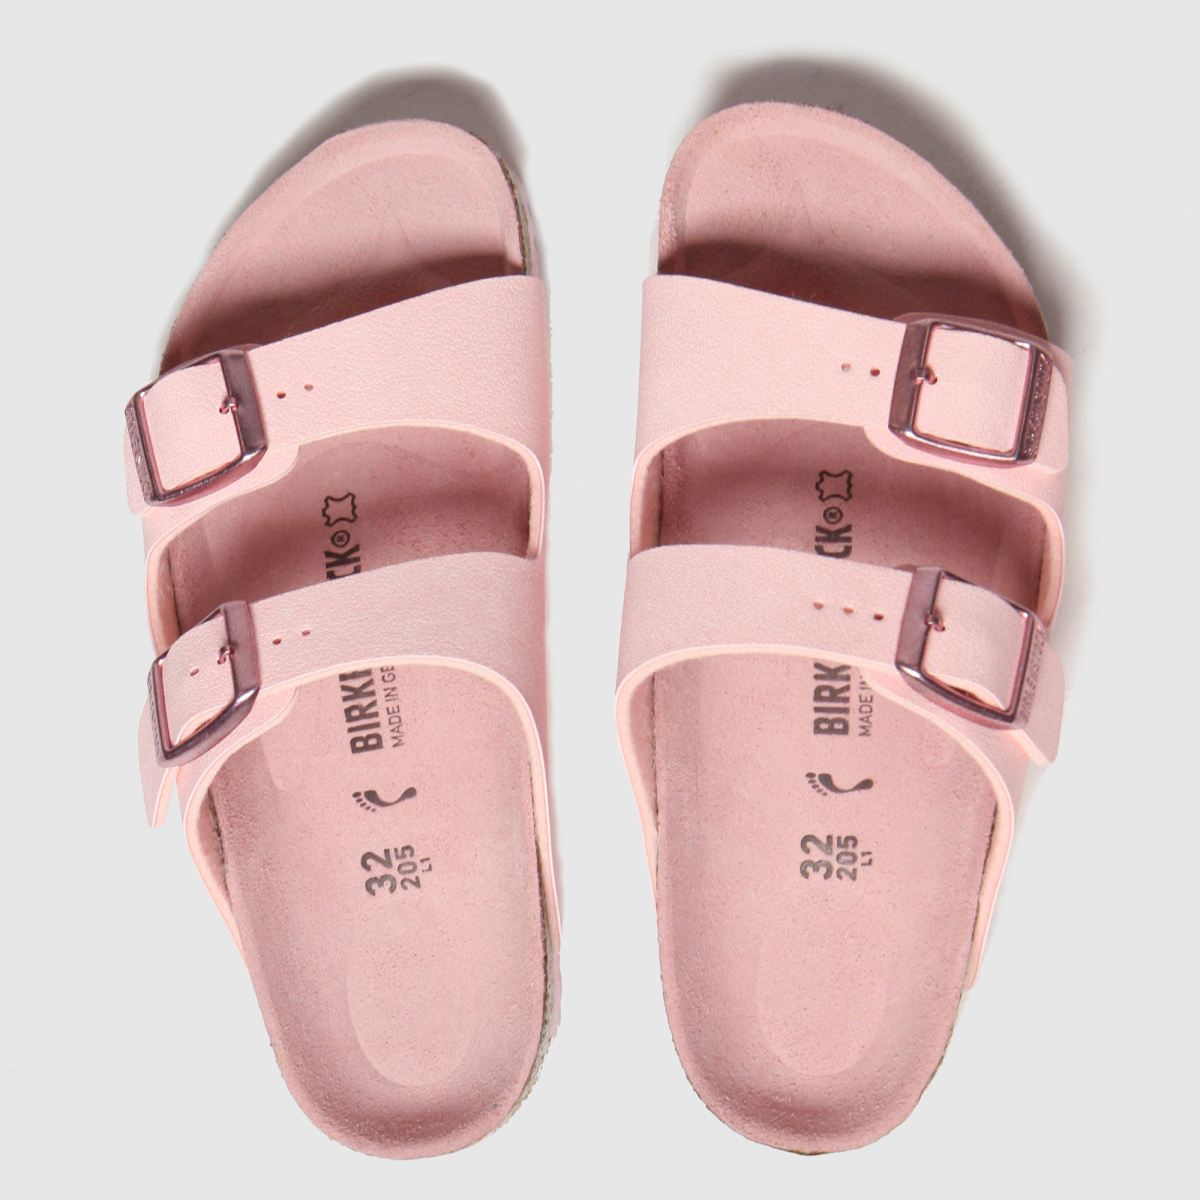 Birkenstock Pale Pink Arizona Sandals